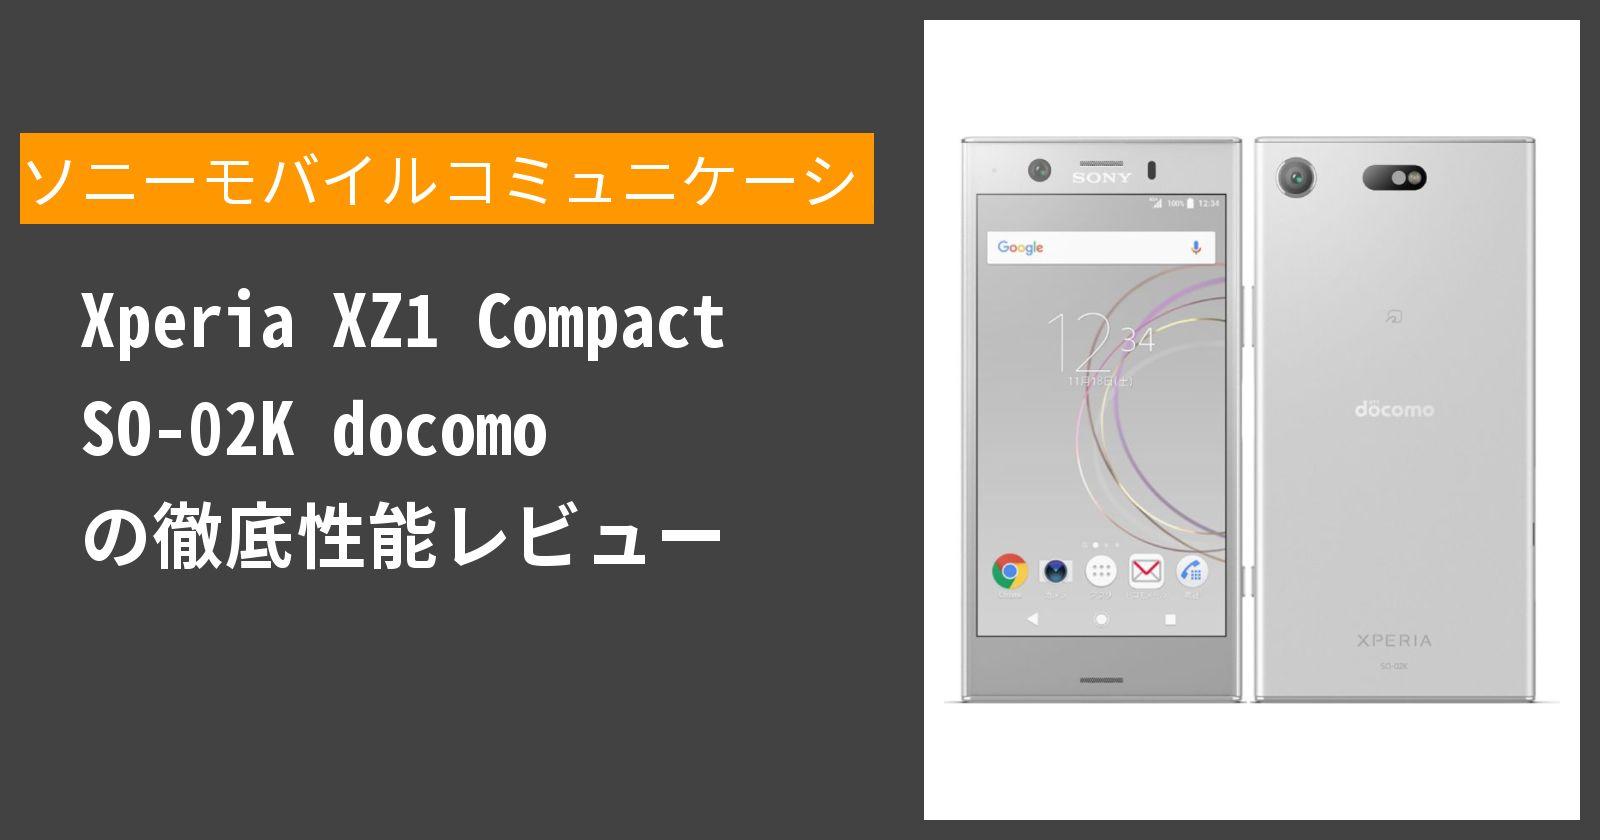 Xperia XZ1 Compact SO-02K docomo の徹底性能レビュー